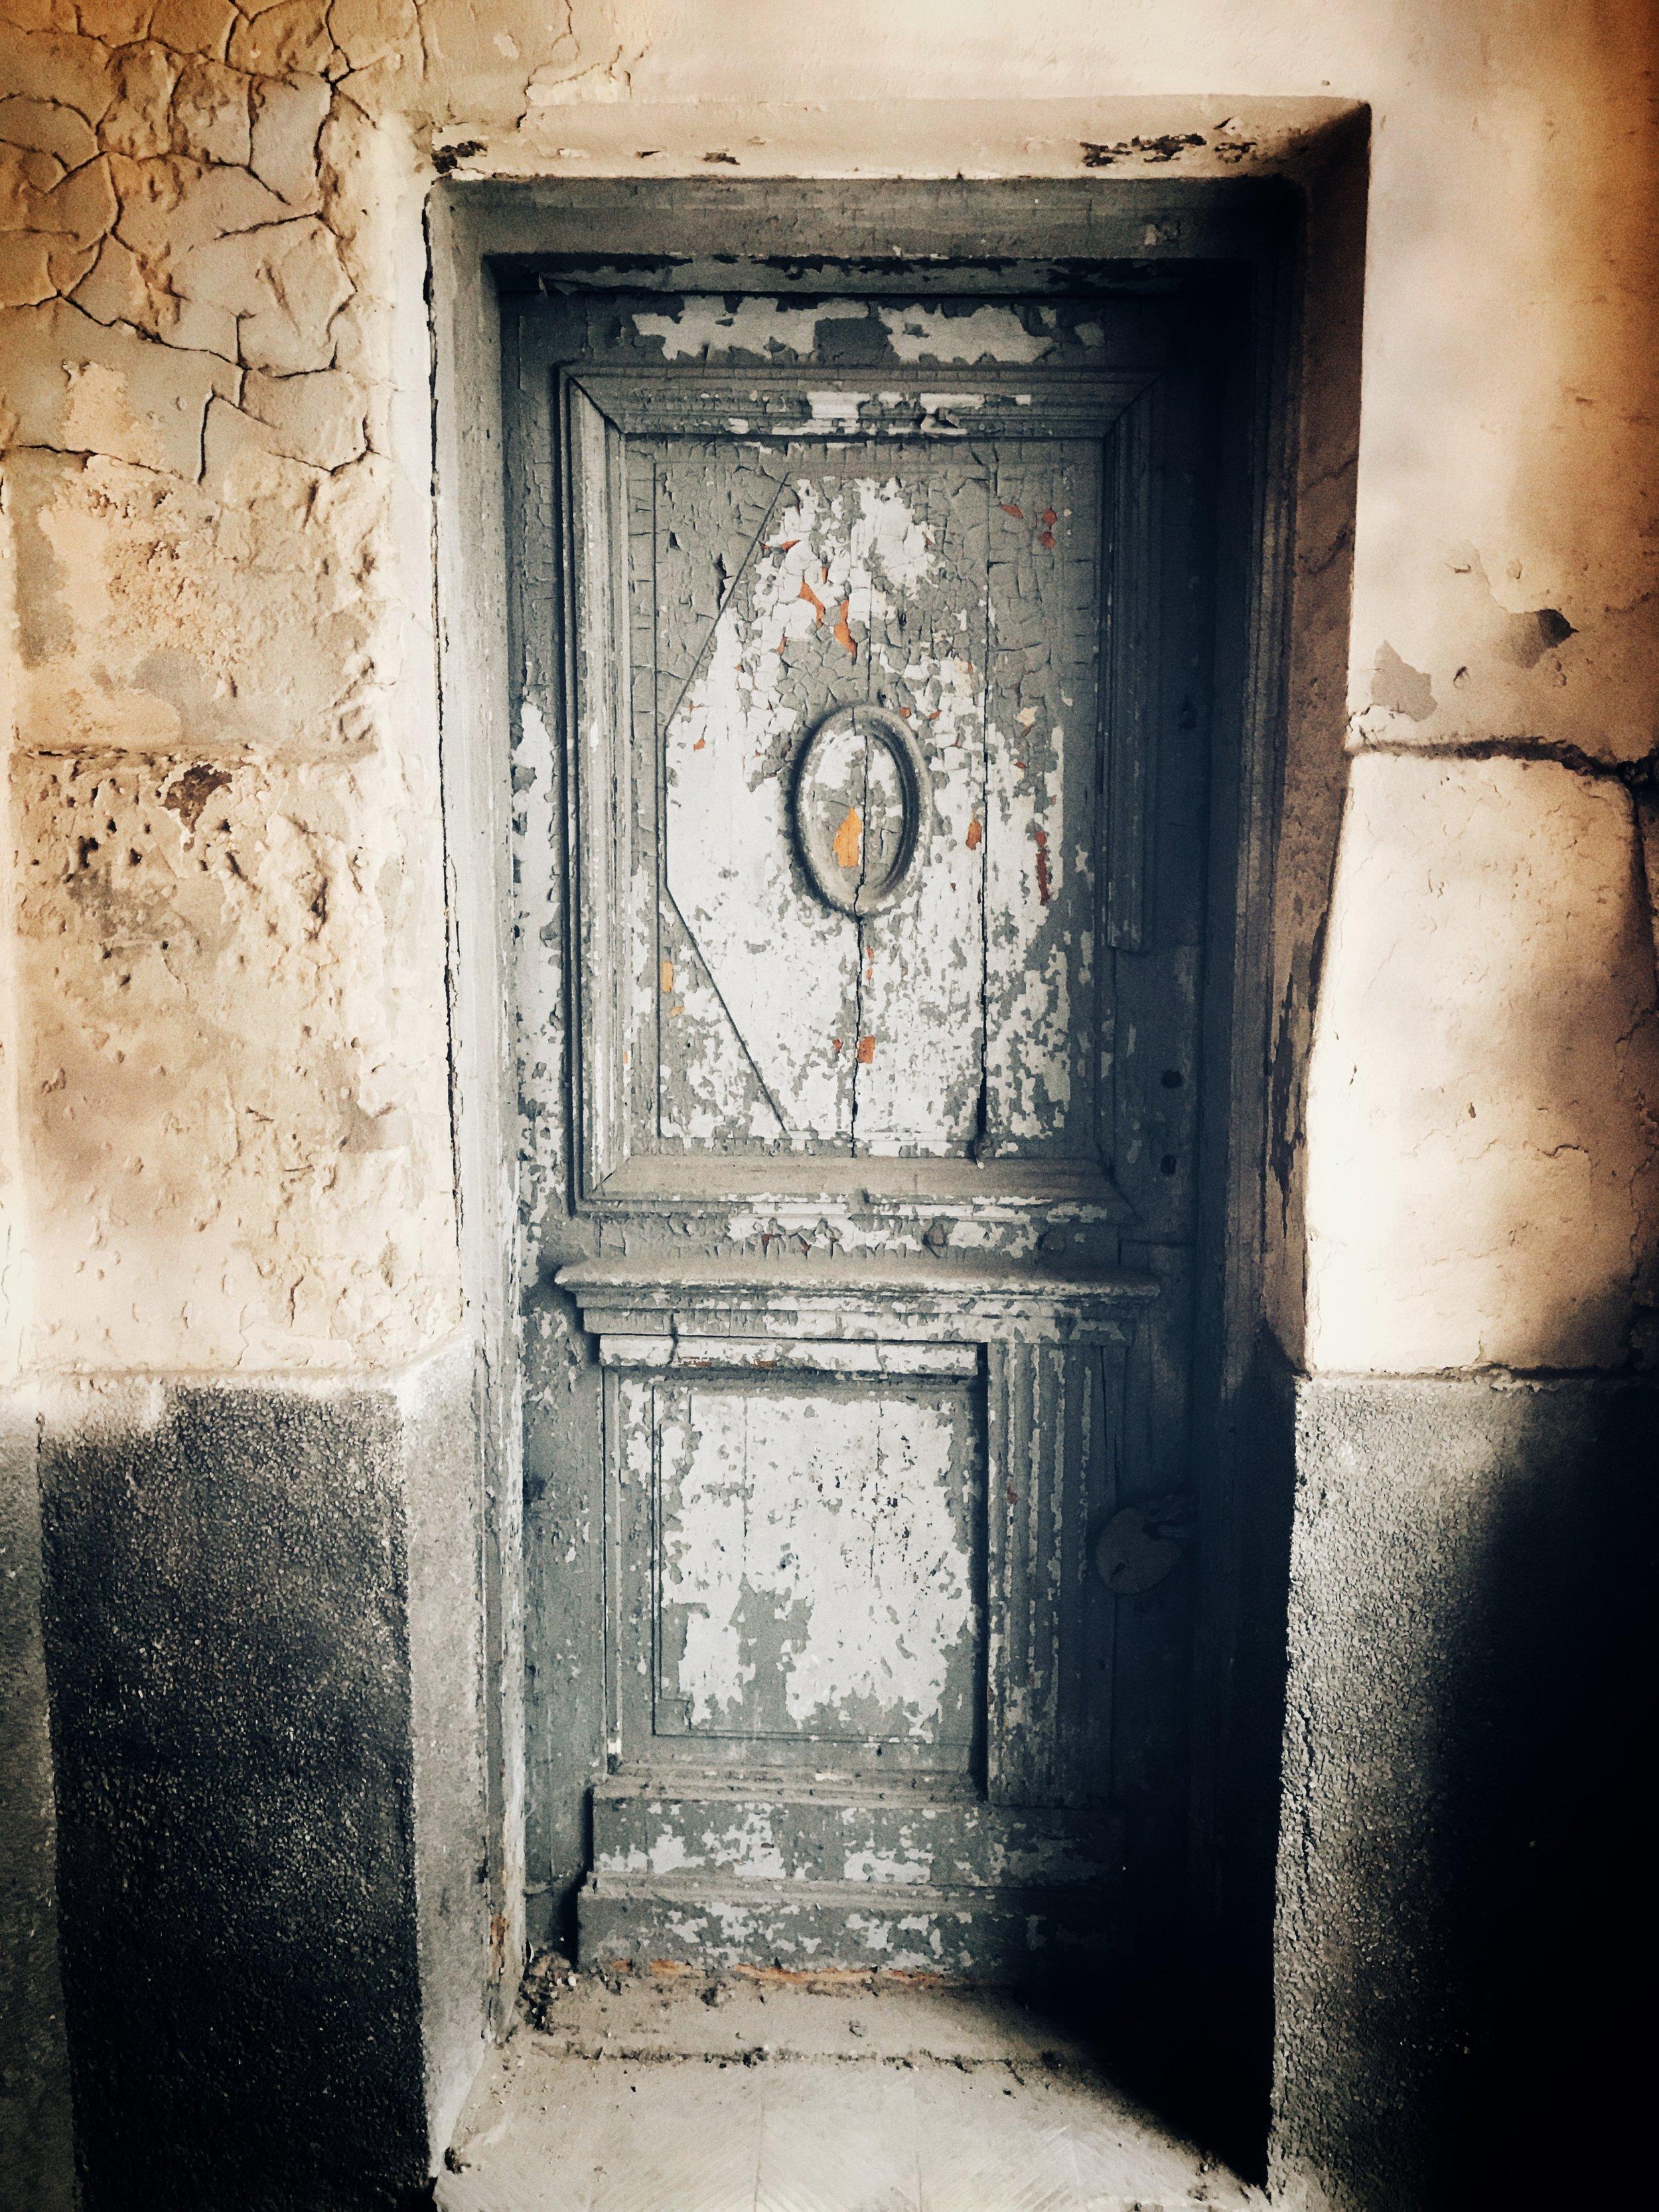 doorway, survived the war